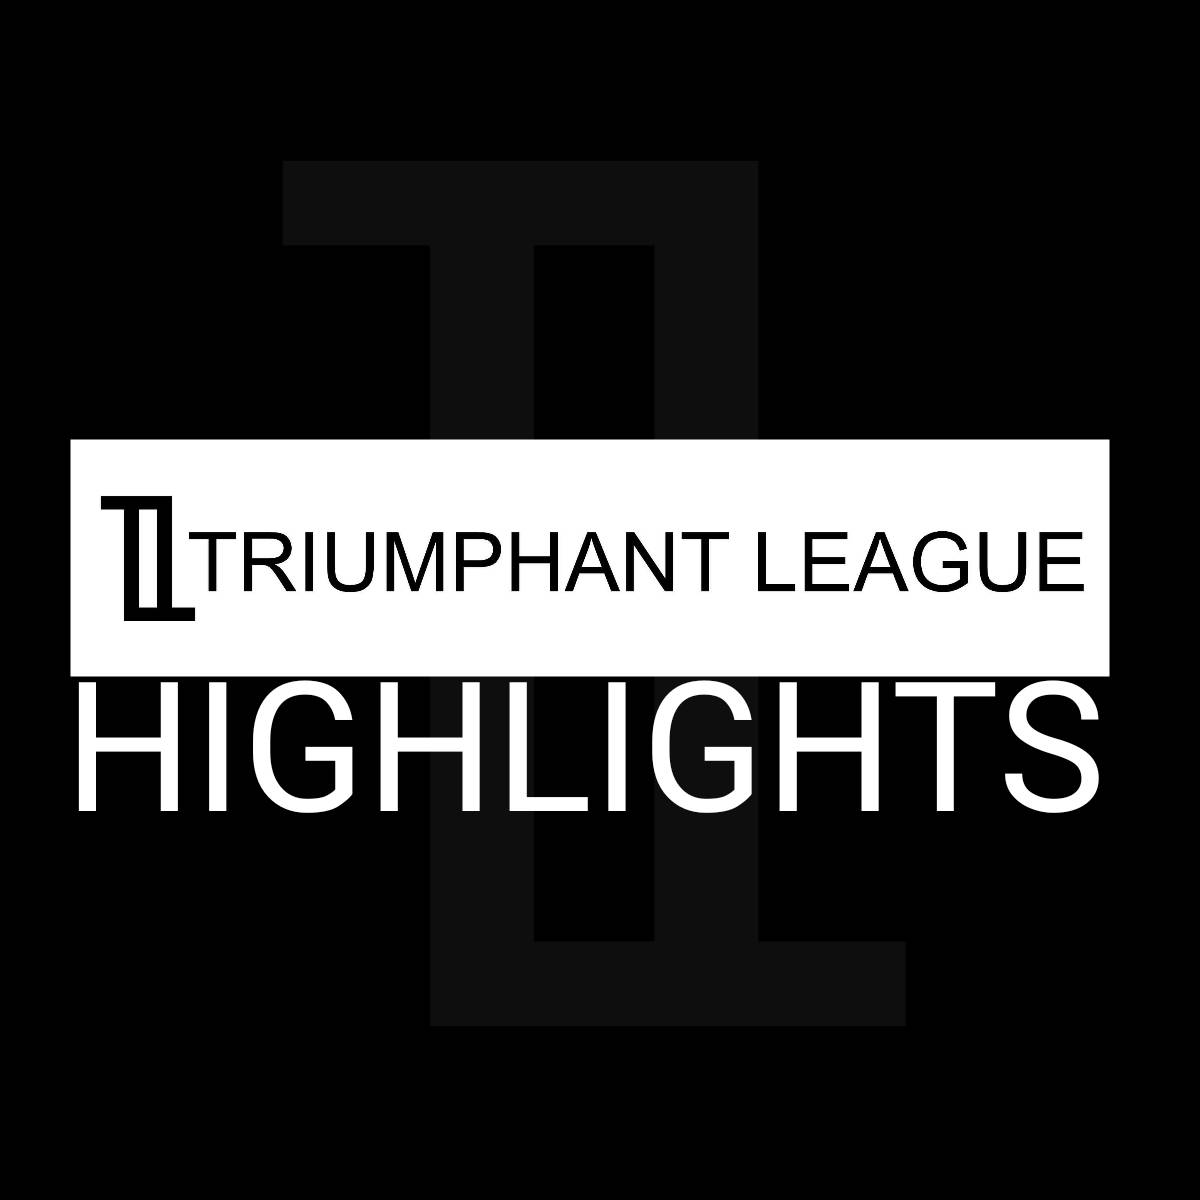 Triumphant League Highlights